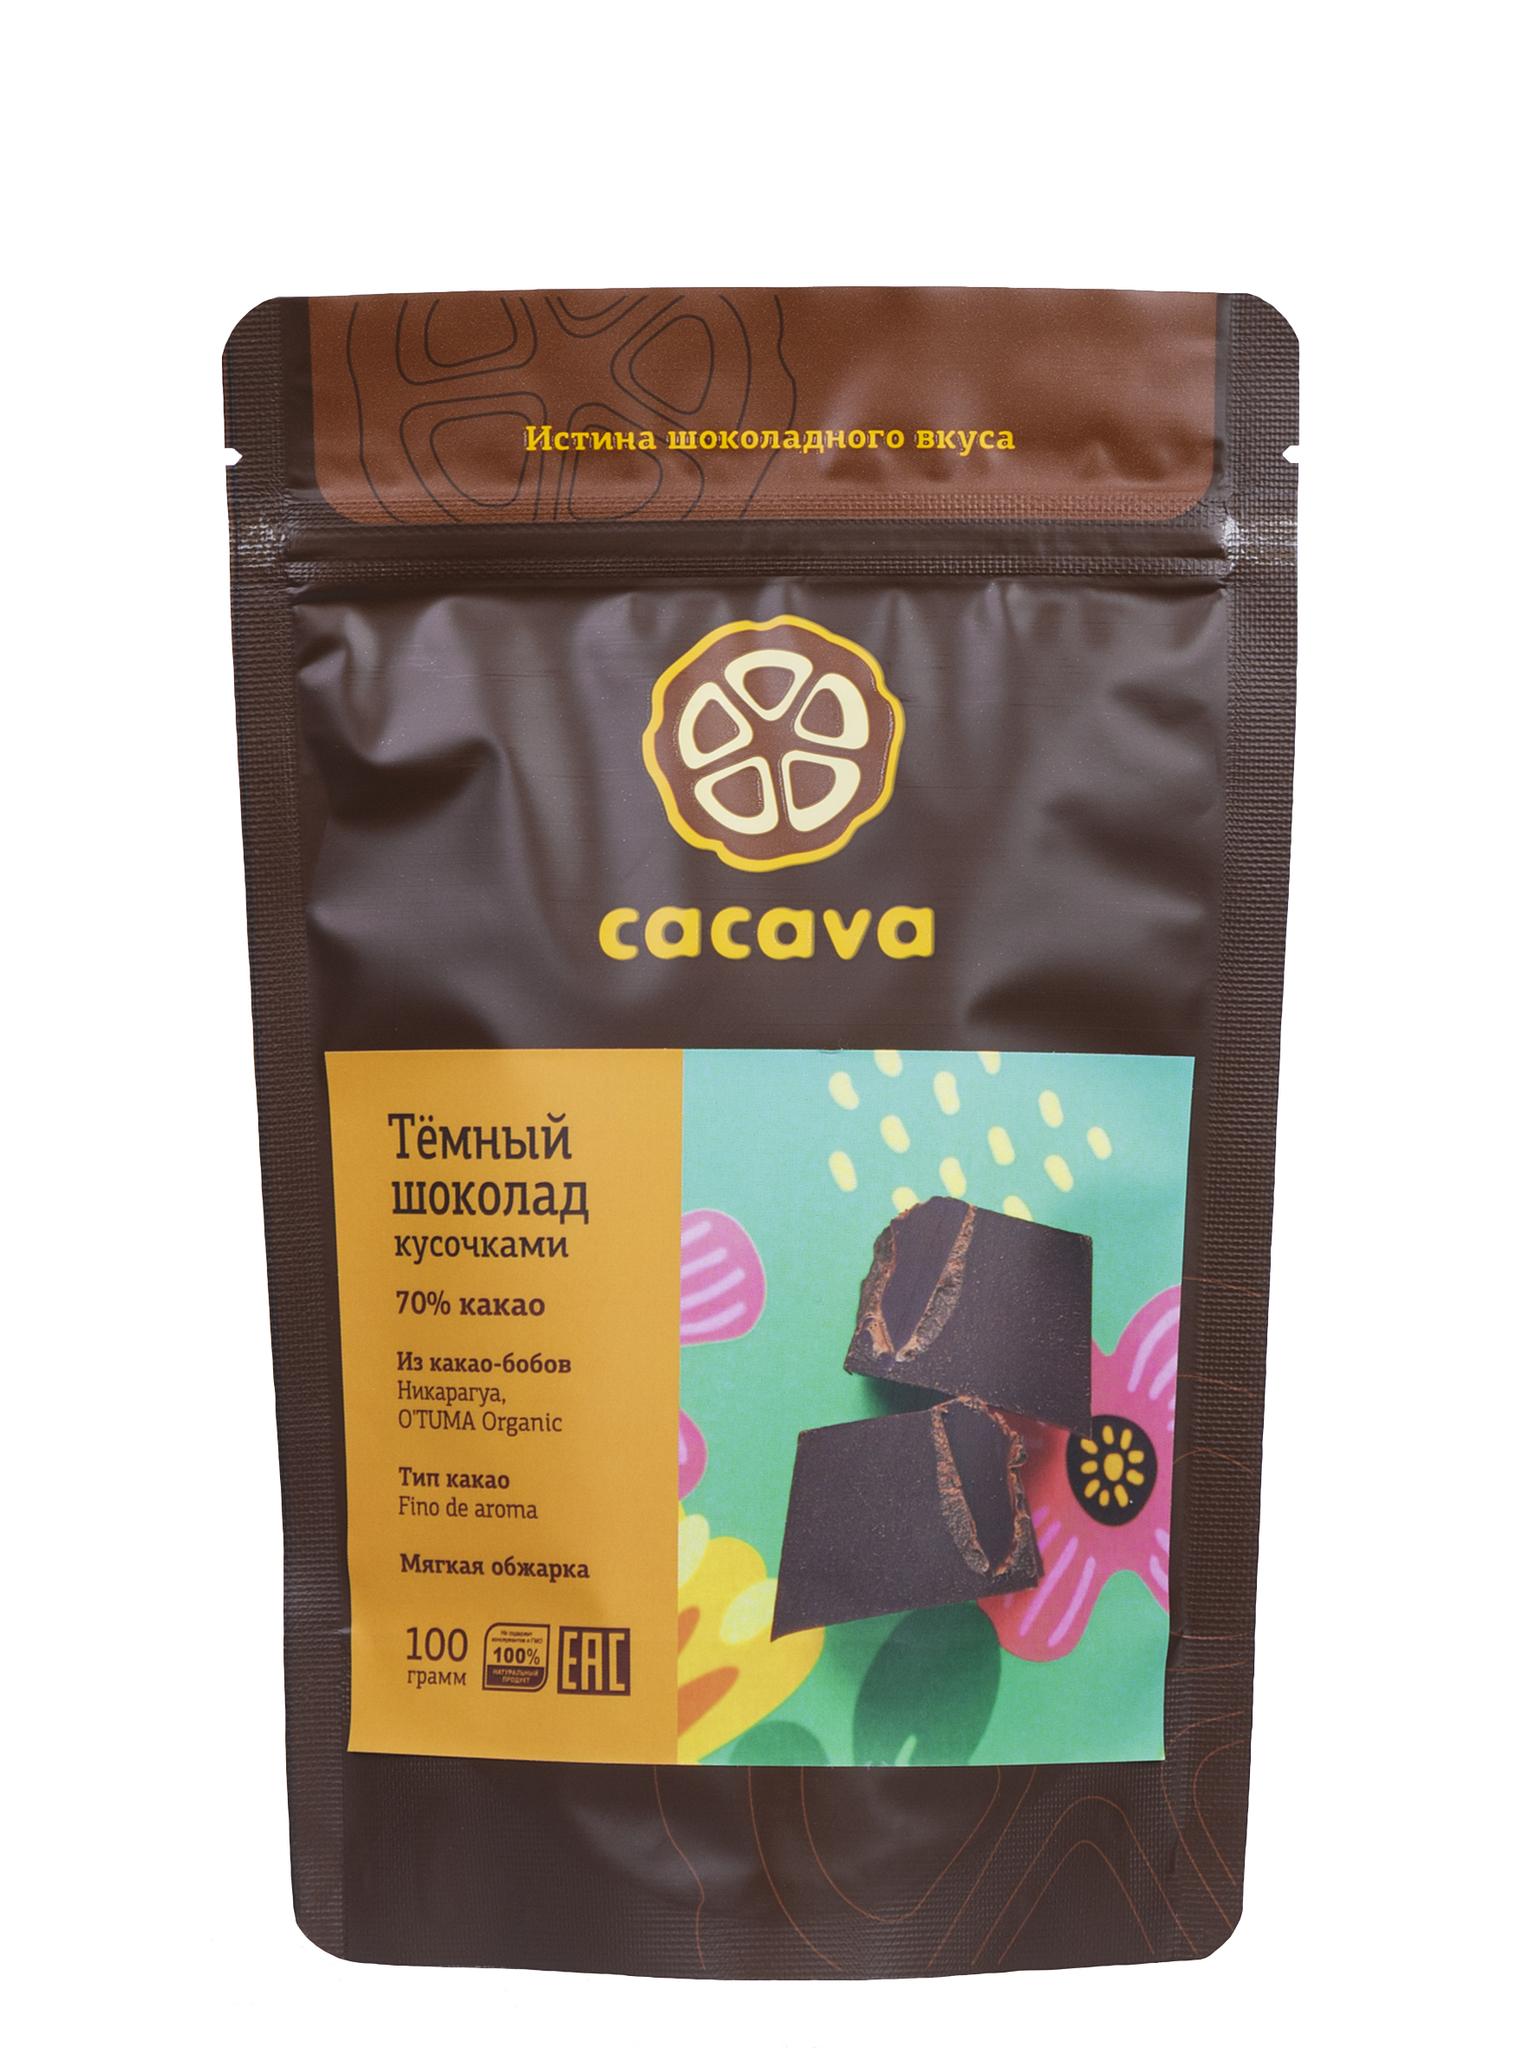 Тёмный шоколад 70 % какао (Никарагуа O'Tuma), упаковка 100 грамм